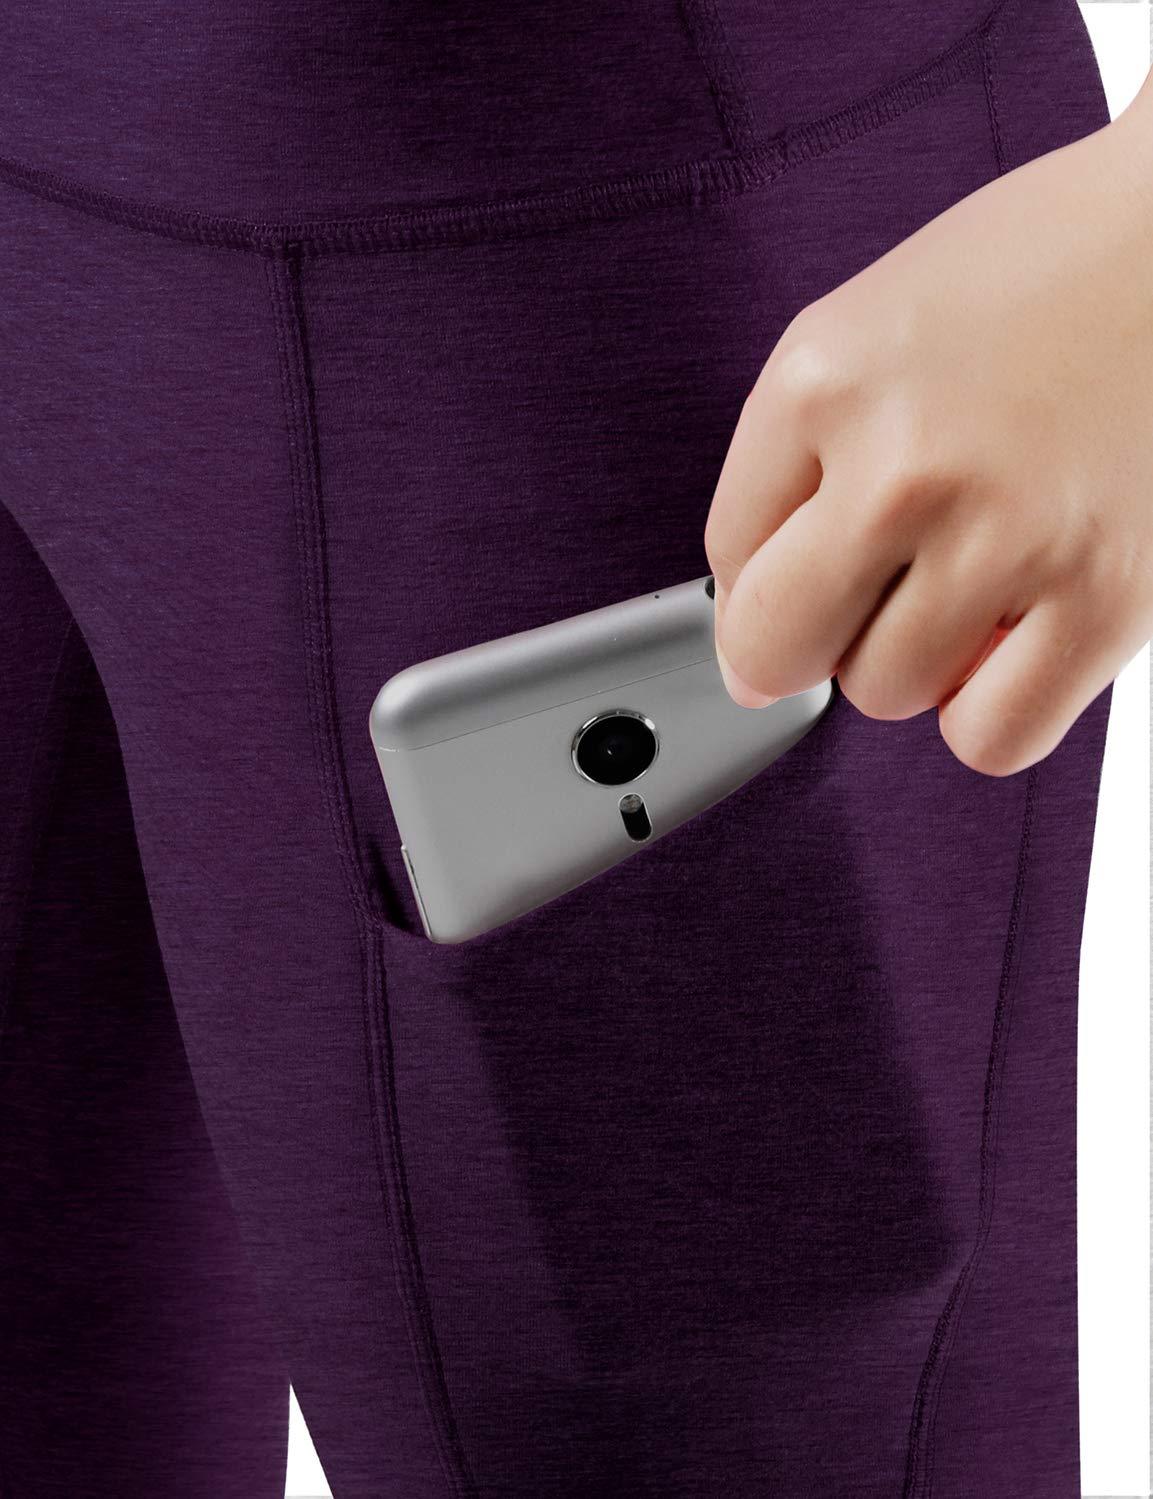 ODODOS High Waist Out Pocket Yoga Capris Pants Tummy Control Workout Running 4 Way Stretch Yoga Leggings,DeepPurple,X-Small by ODODOS (Image #4)